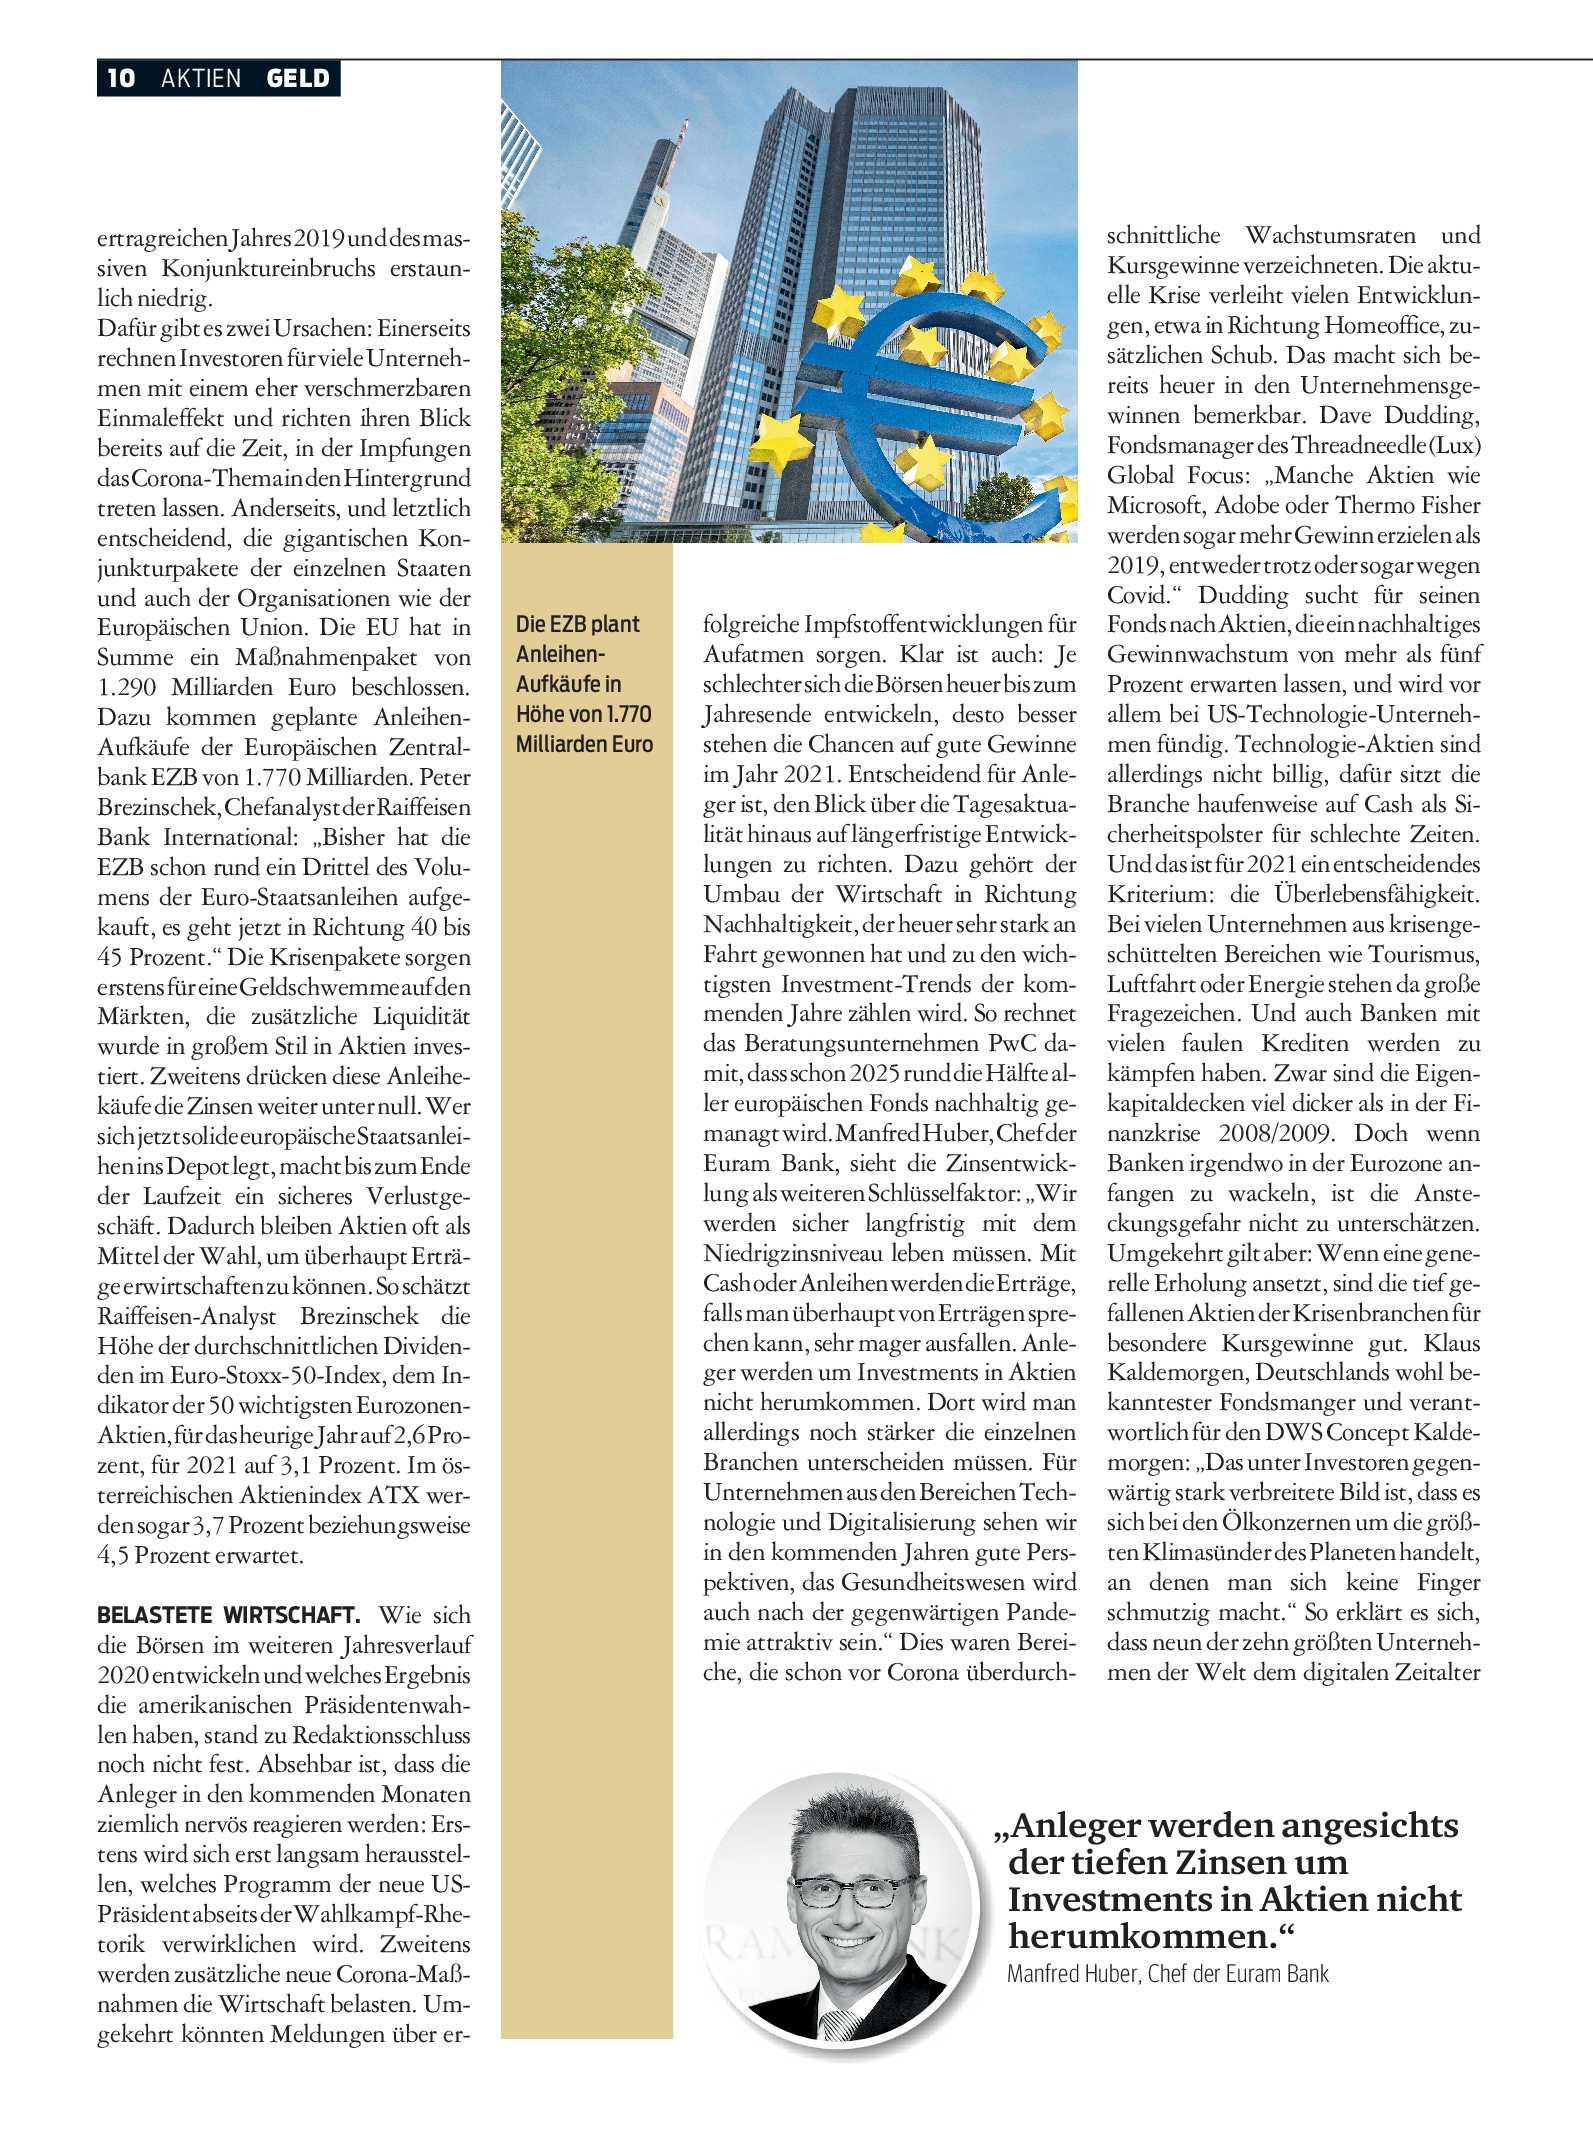 public/epaper/imported/20201118/kurier/magazin/magazin_20201118_010.jpg